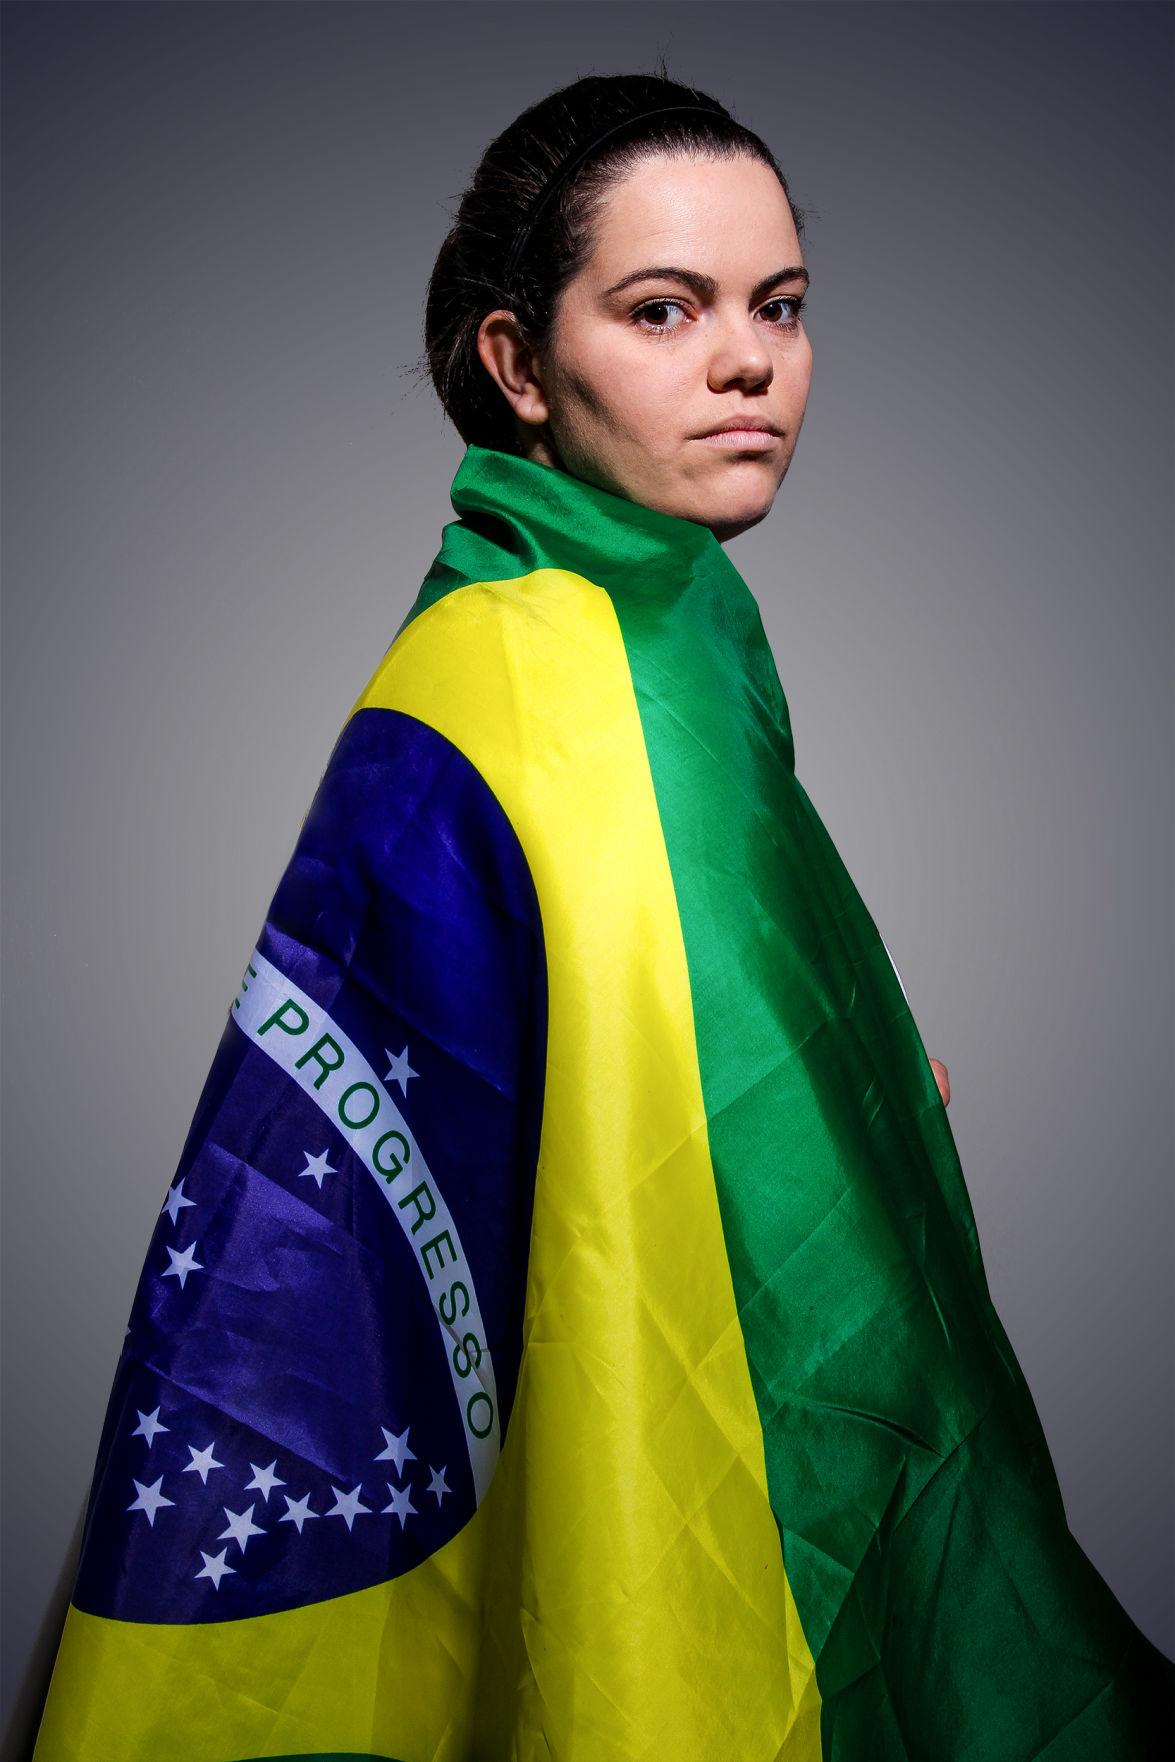 Brazilian-born baller stays true to roots